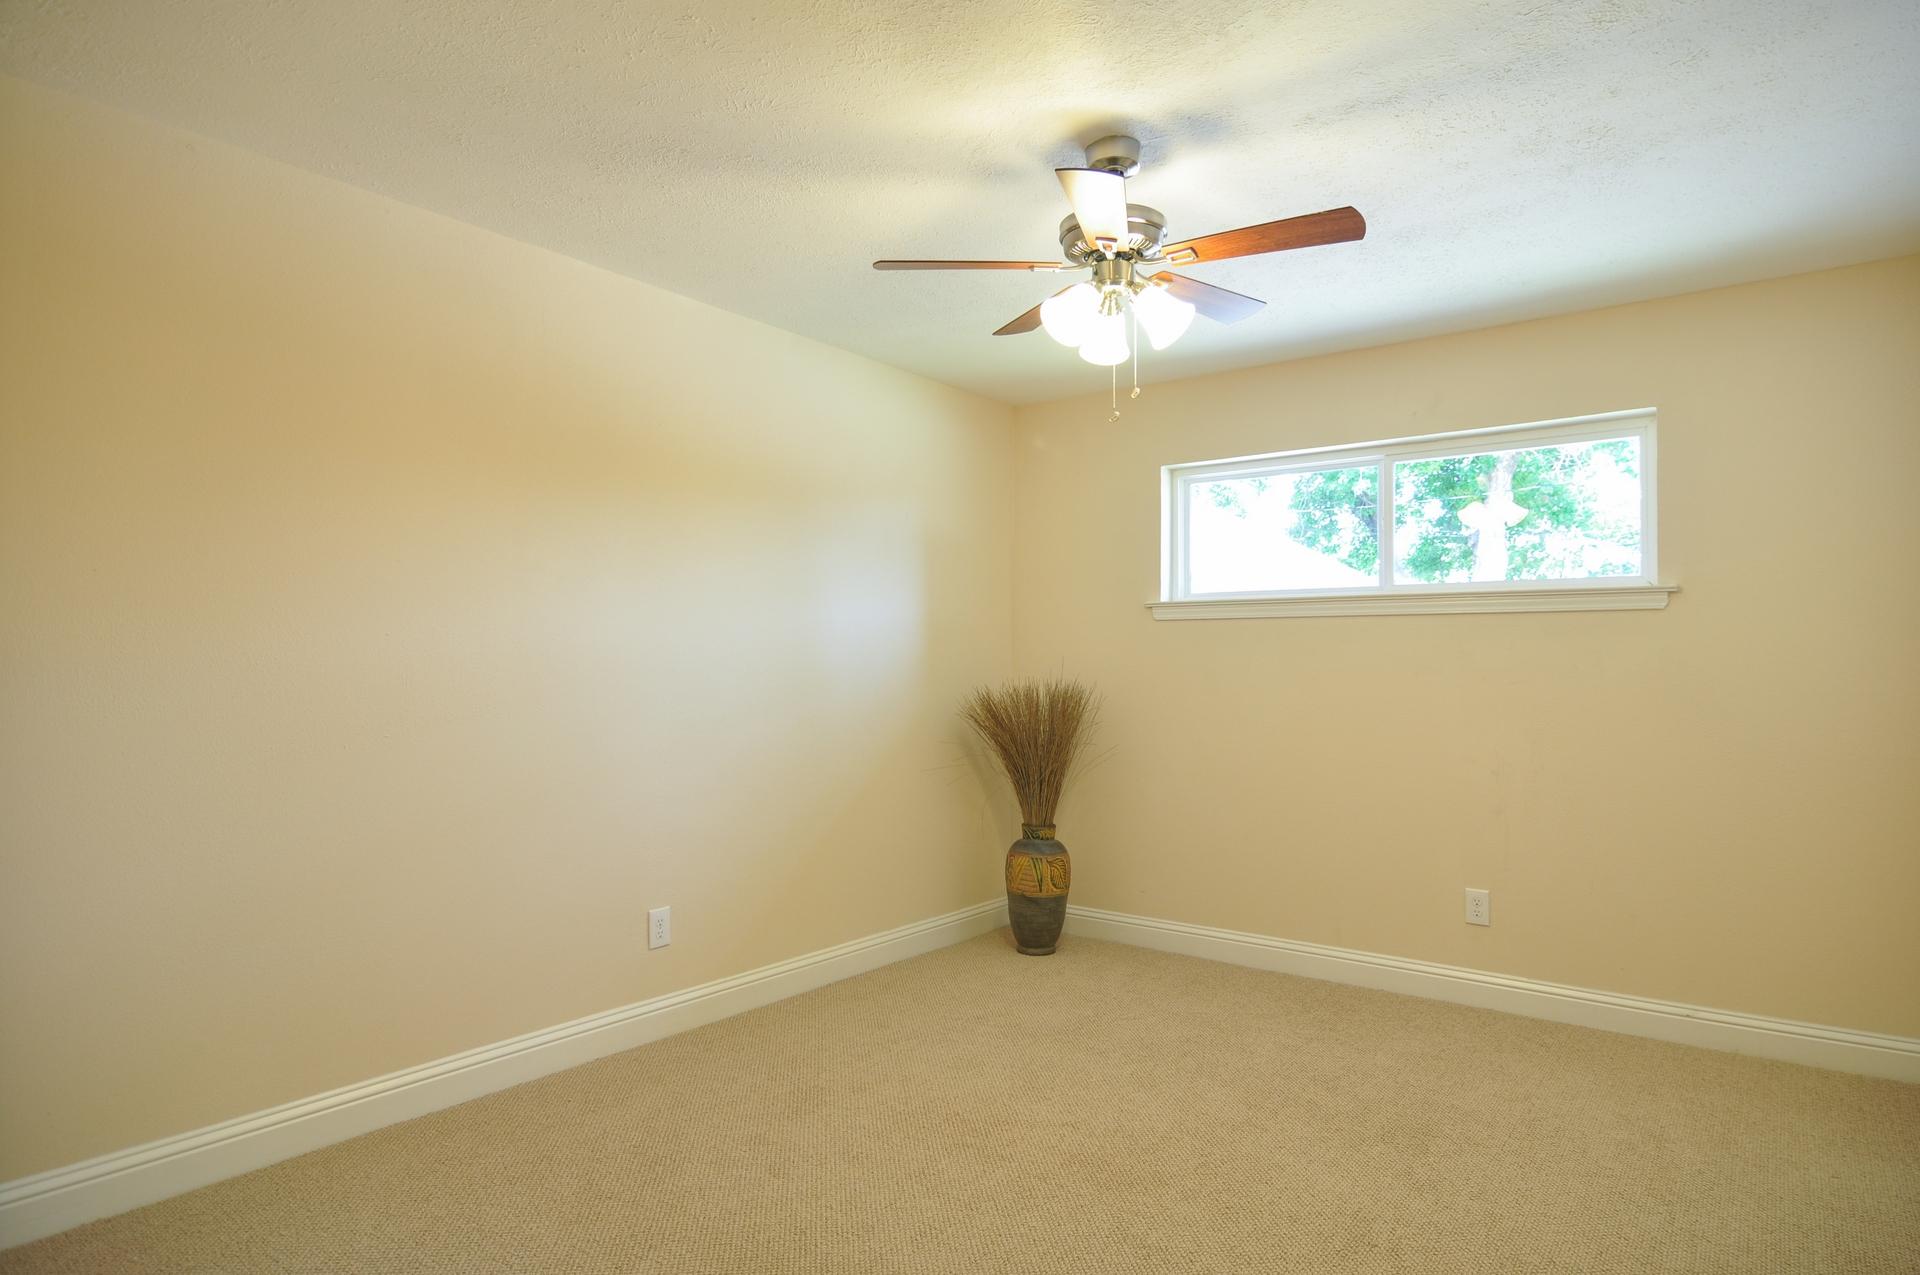 3rd Bedroom 3133 Chapel Downs Dr Dallas TX 75229 Robert Jory.jpg